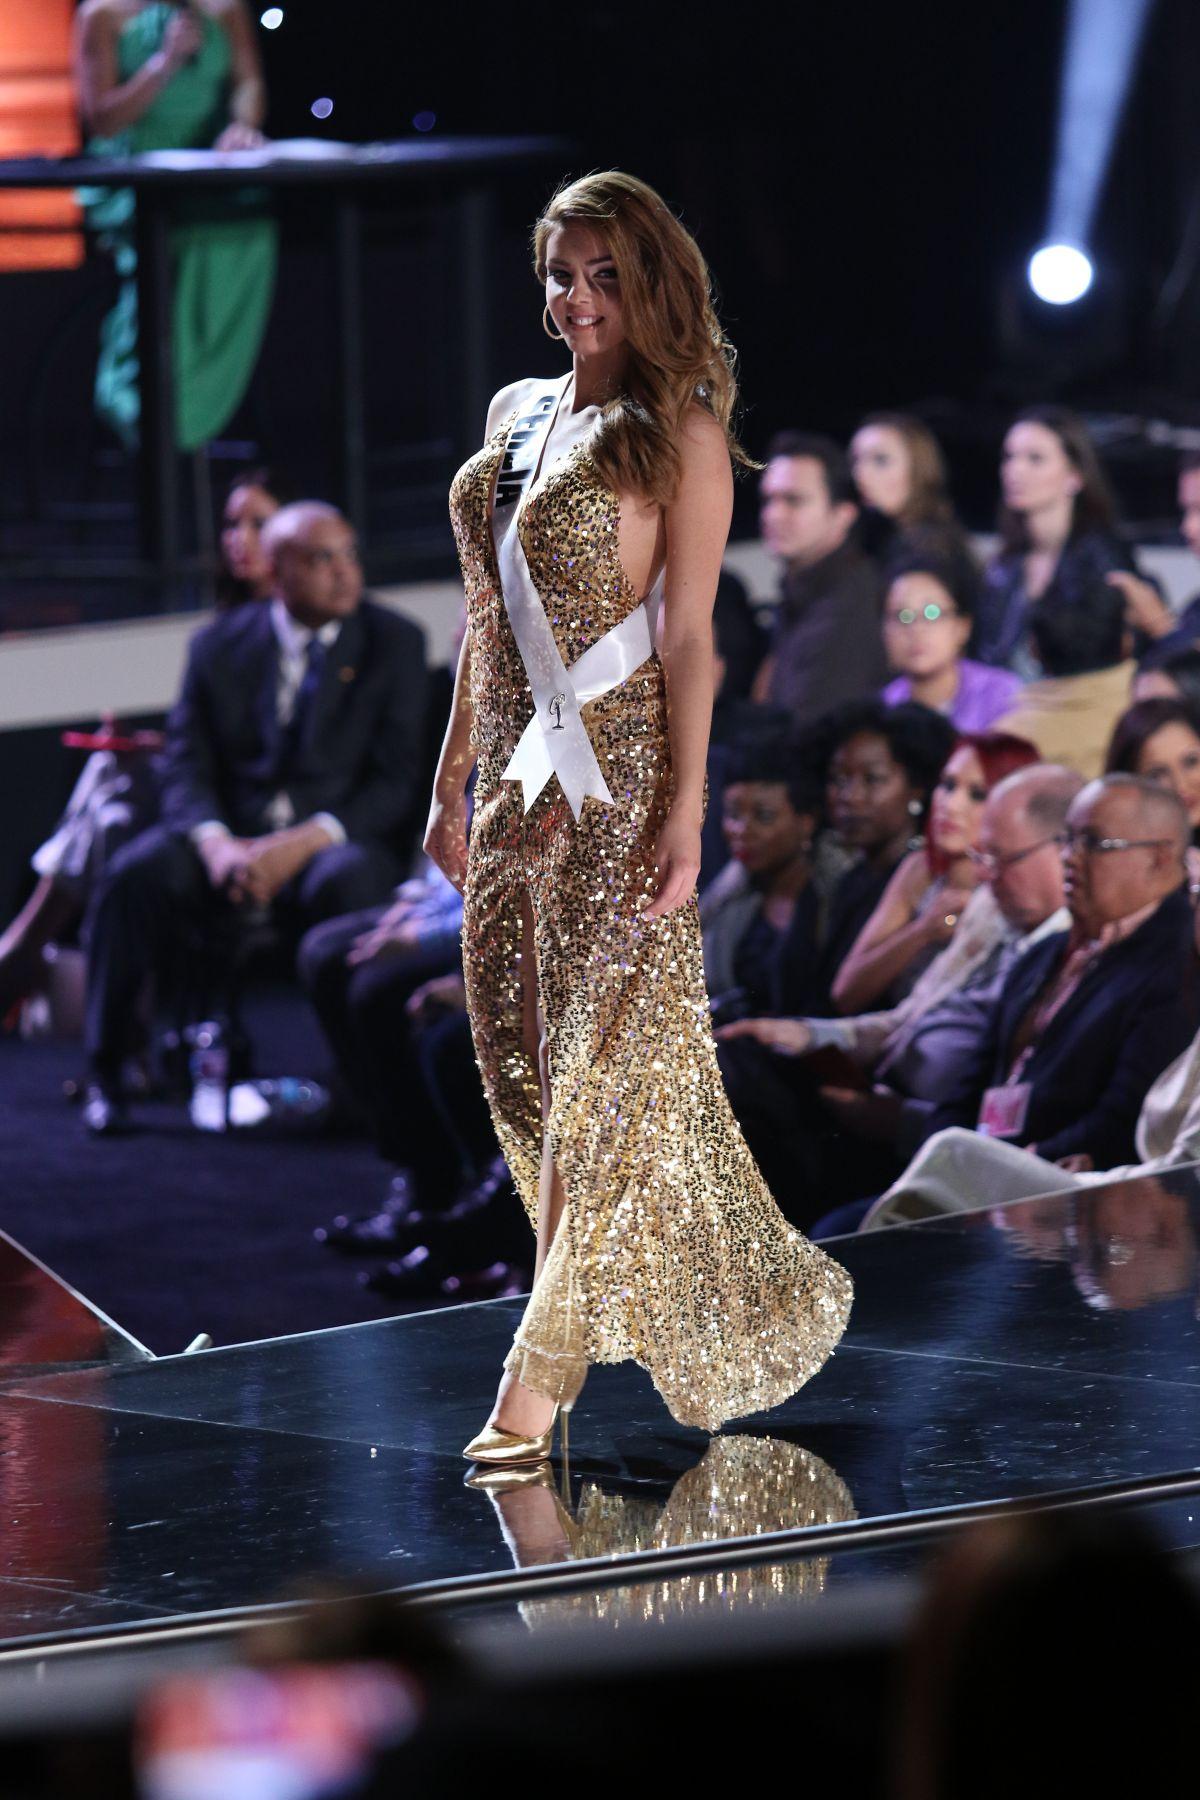 DASA RADOSAVLJEVIC - Miss Universe 2015 pPreliminary Round 12/16/2015